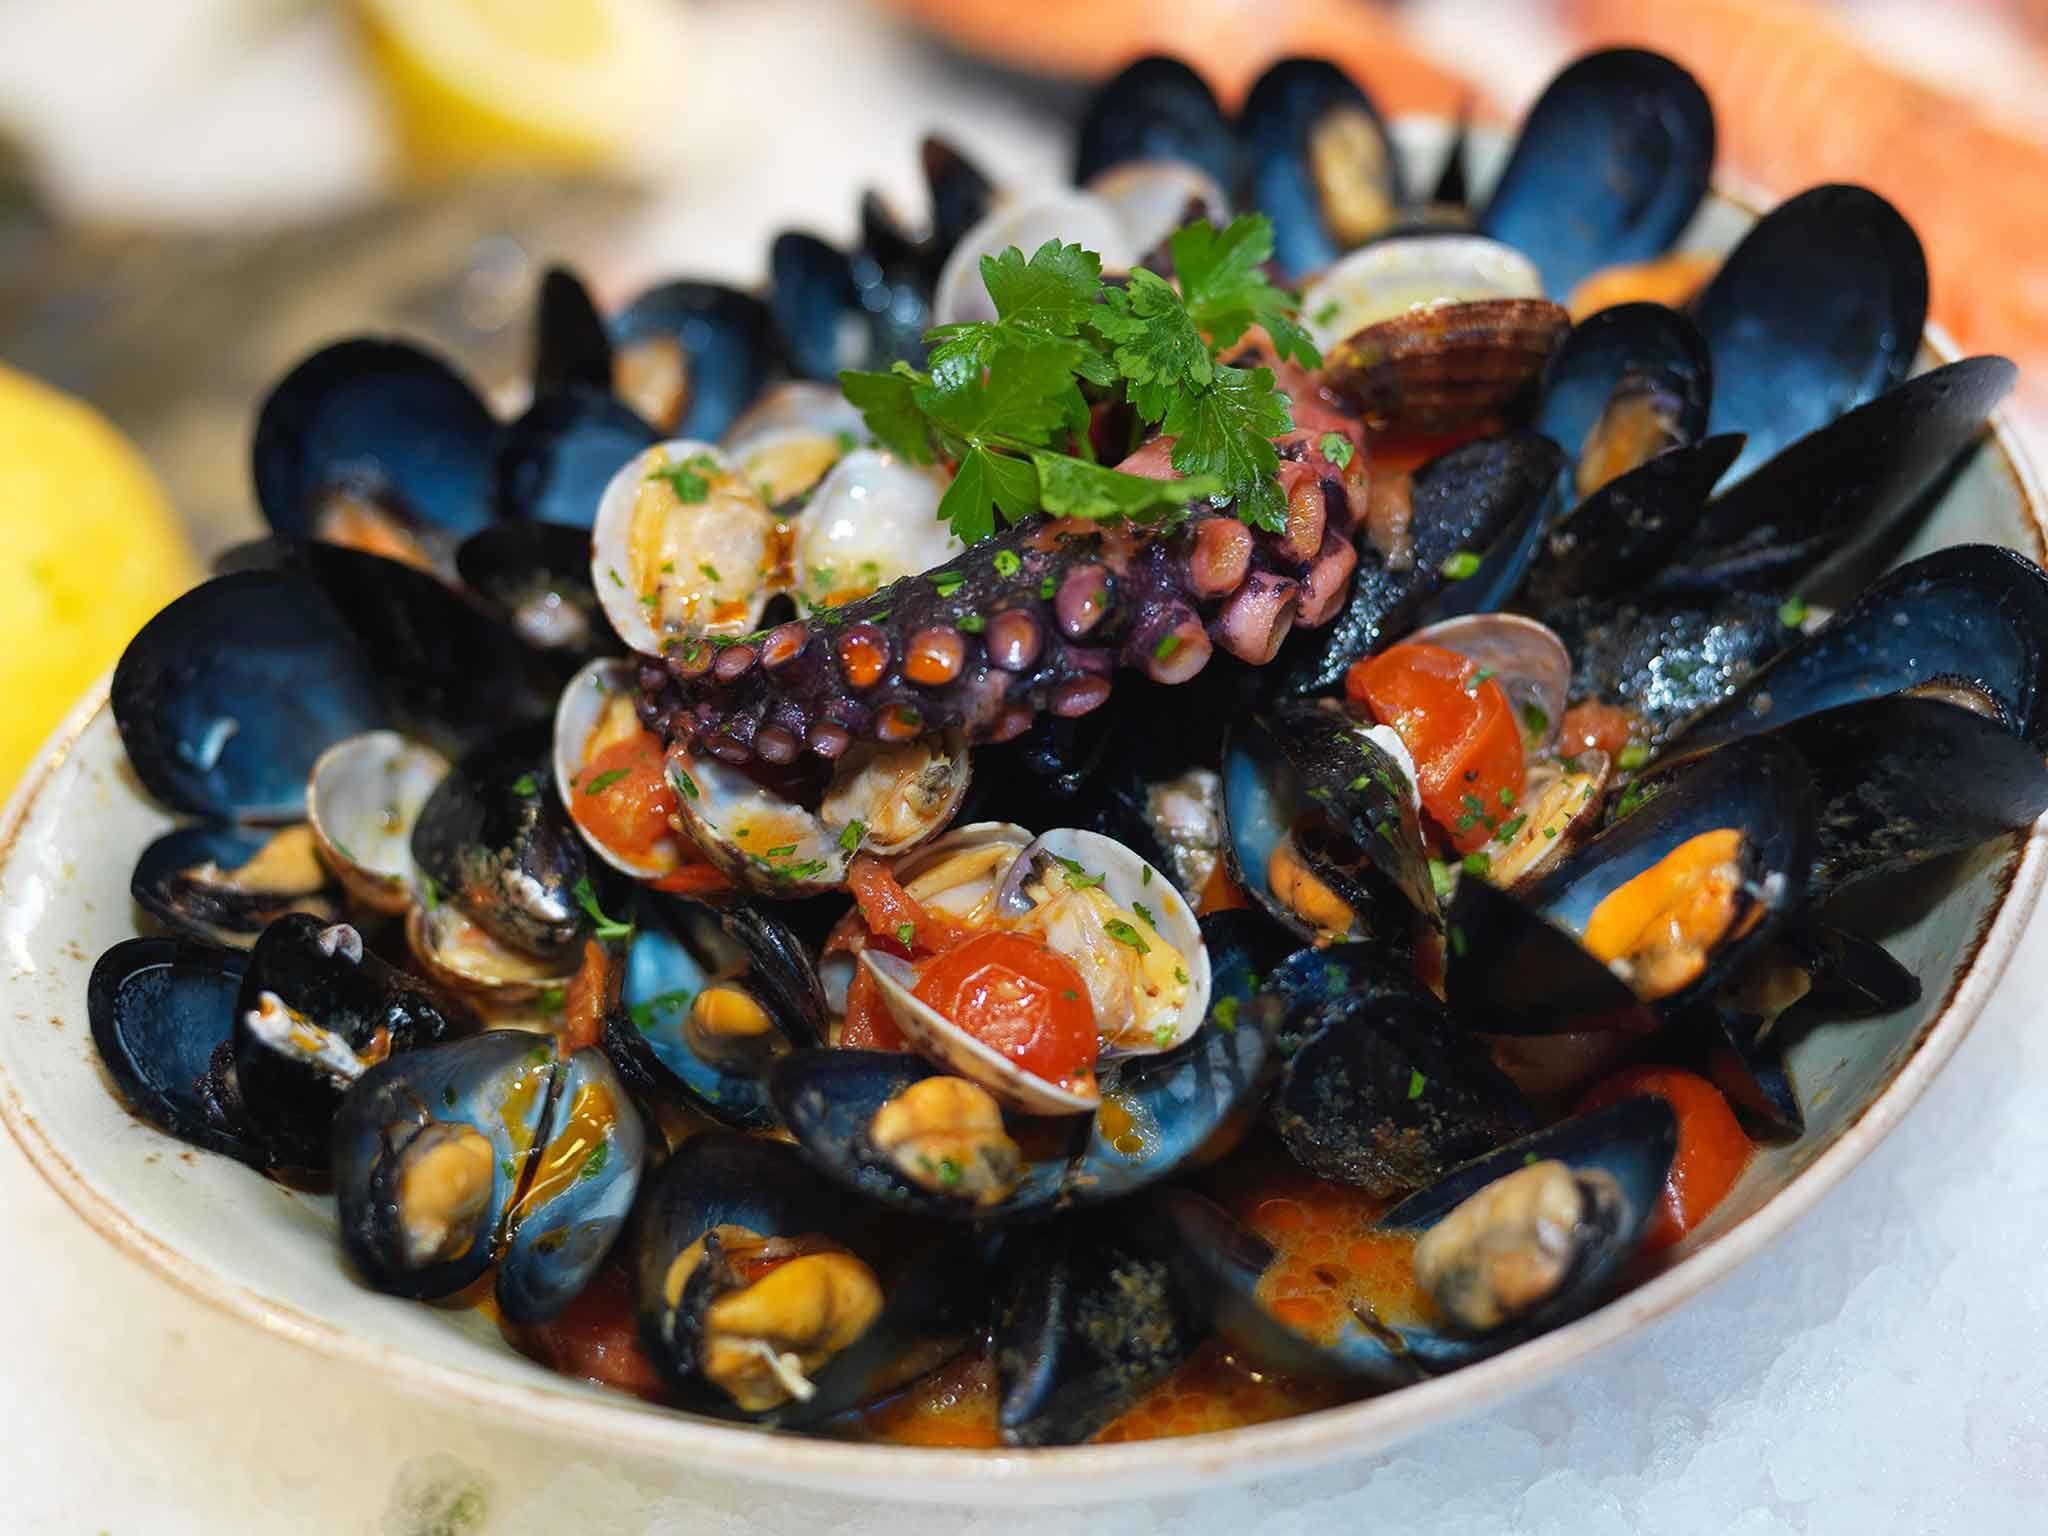 Starter: Italian fish cuisine de Ristorante La Nassa